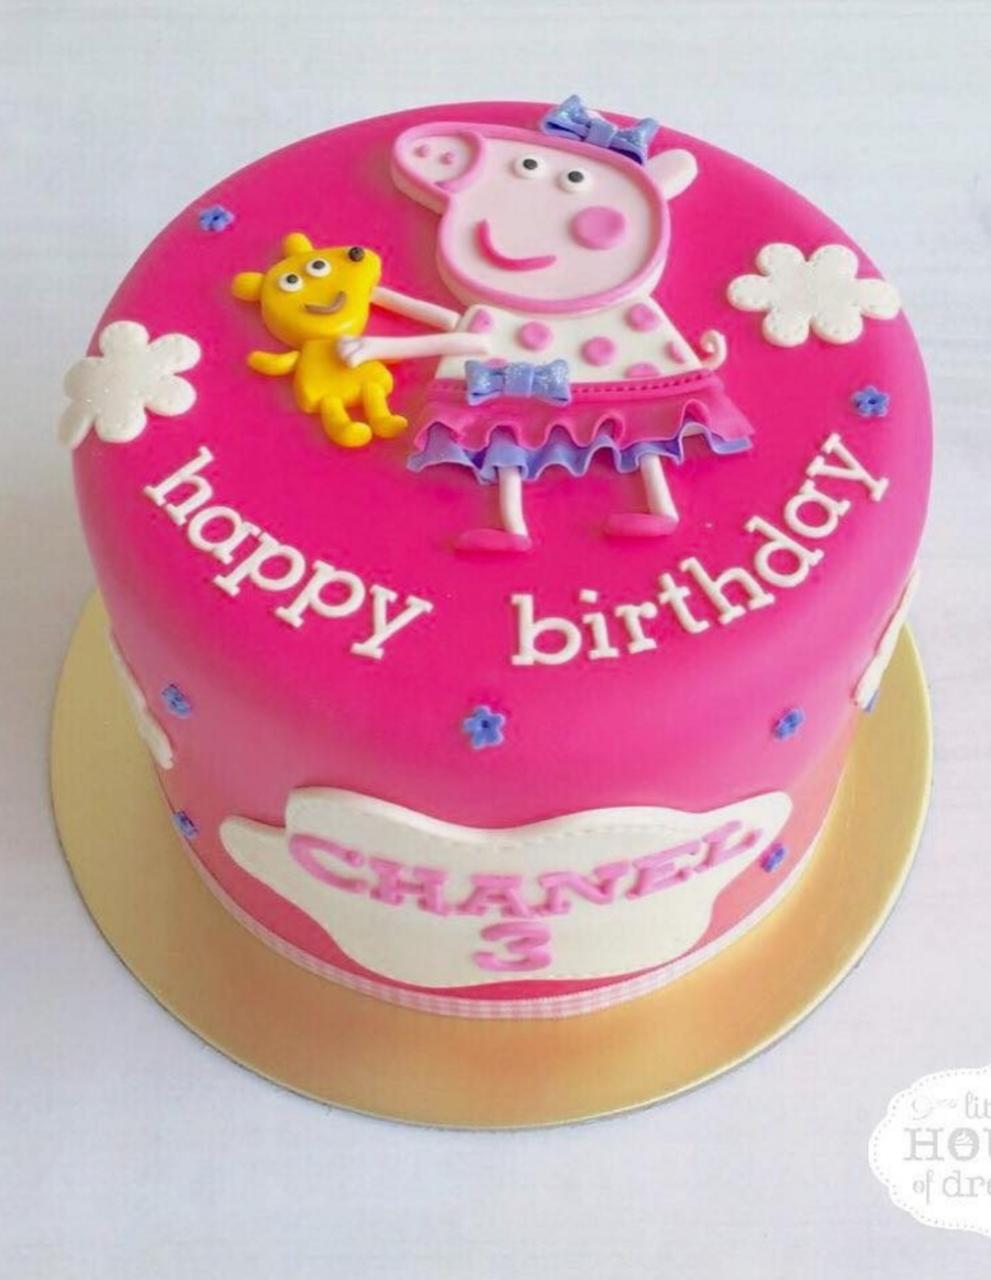 HBD037 - Birthday cake